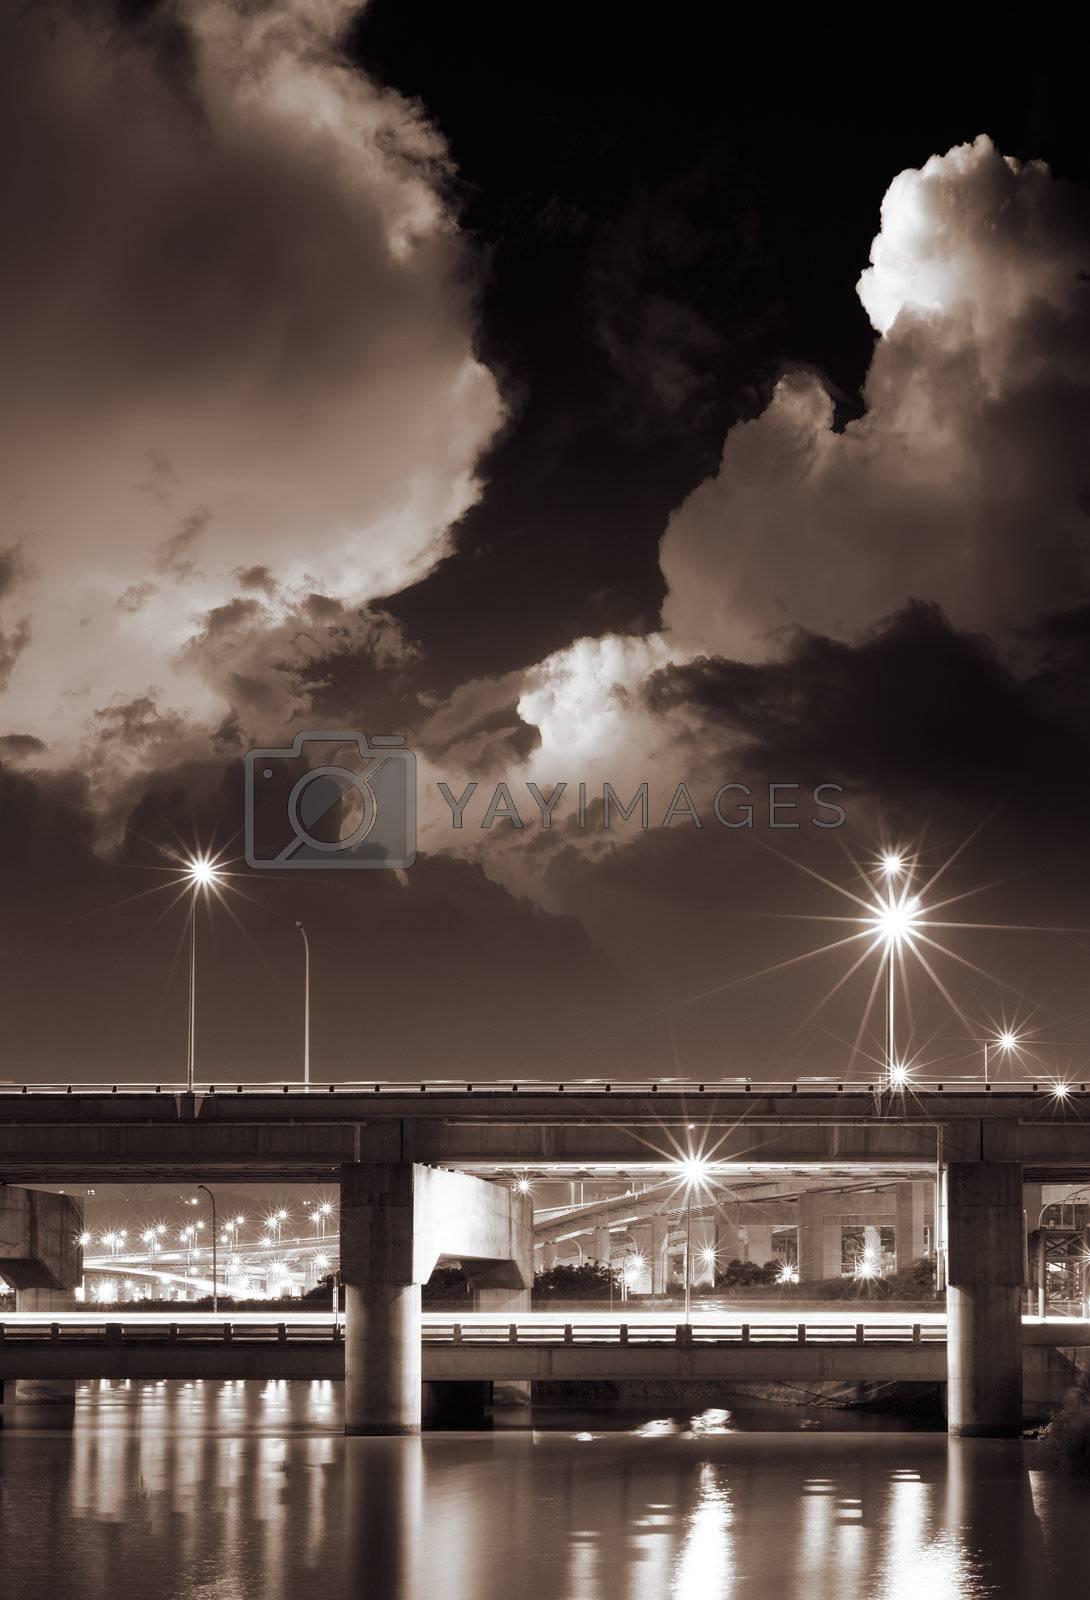 Royalty free image of Cityscape of bridge by elwynn